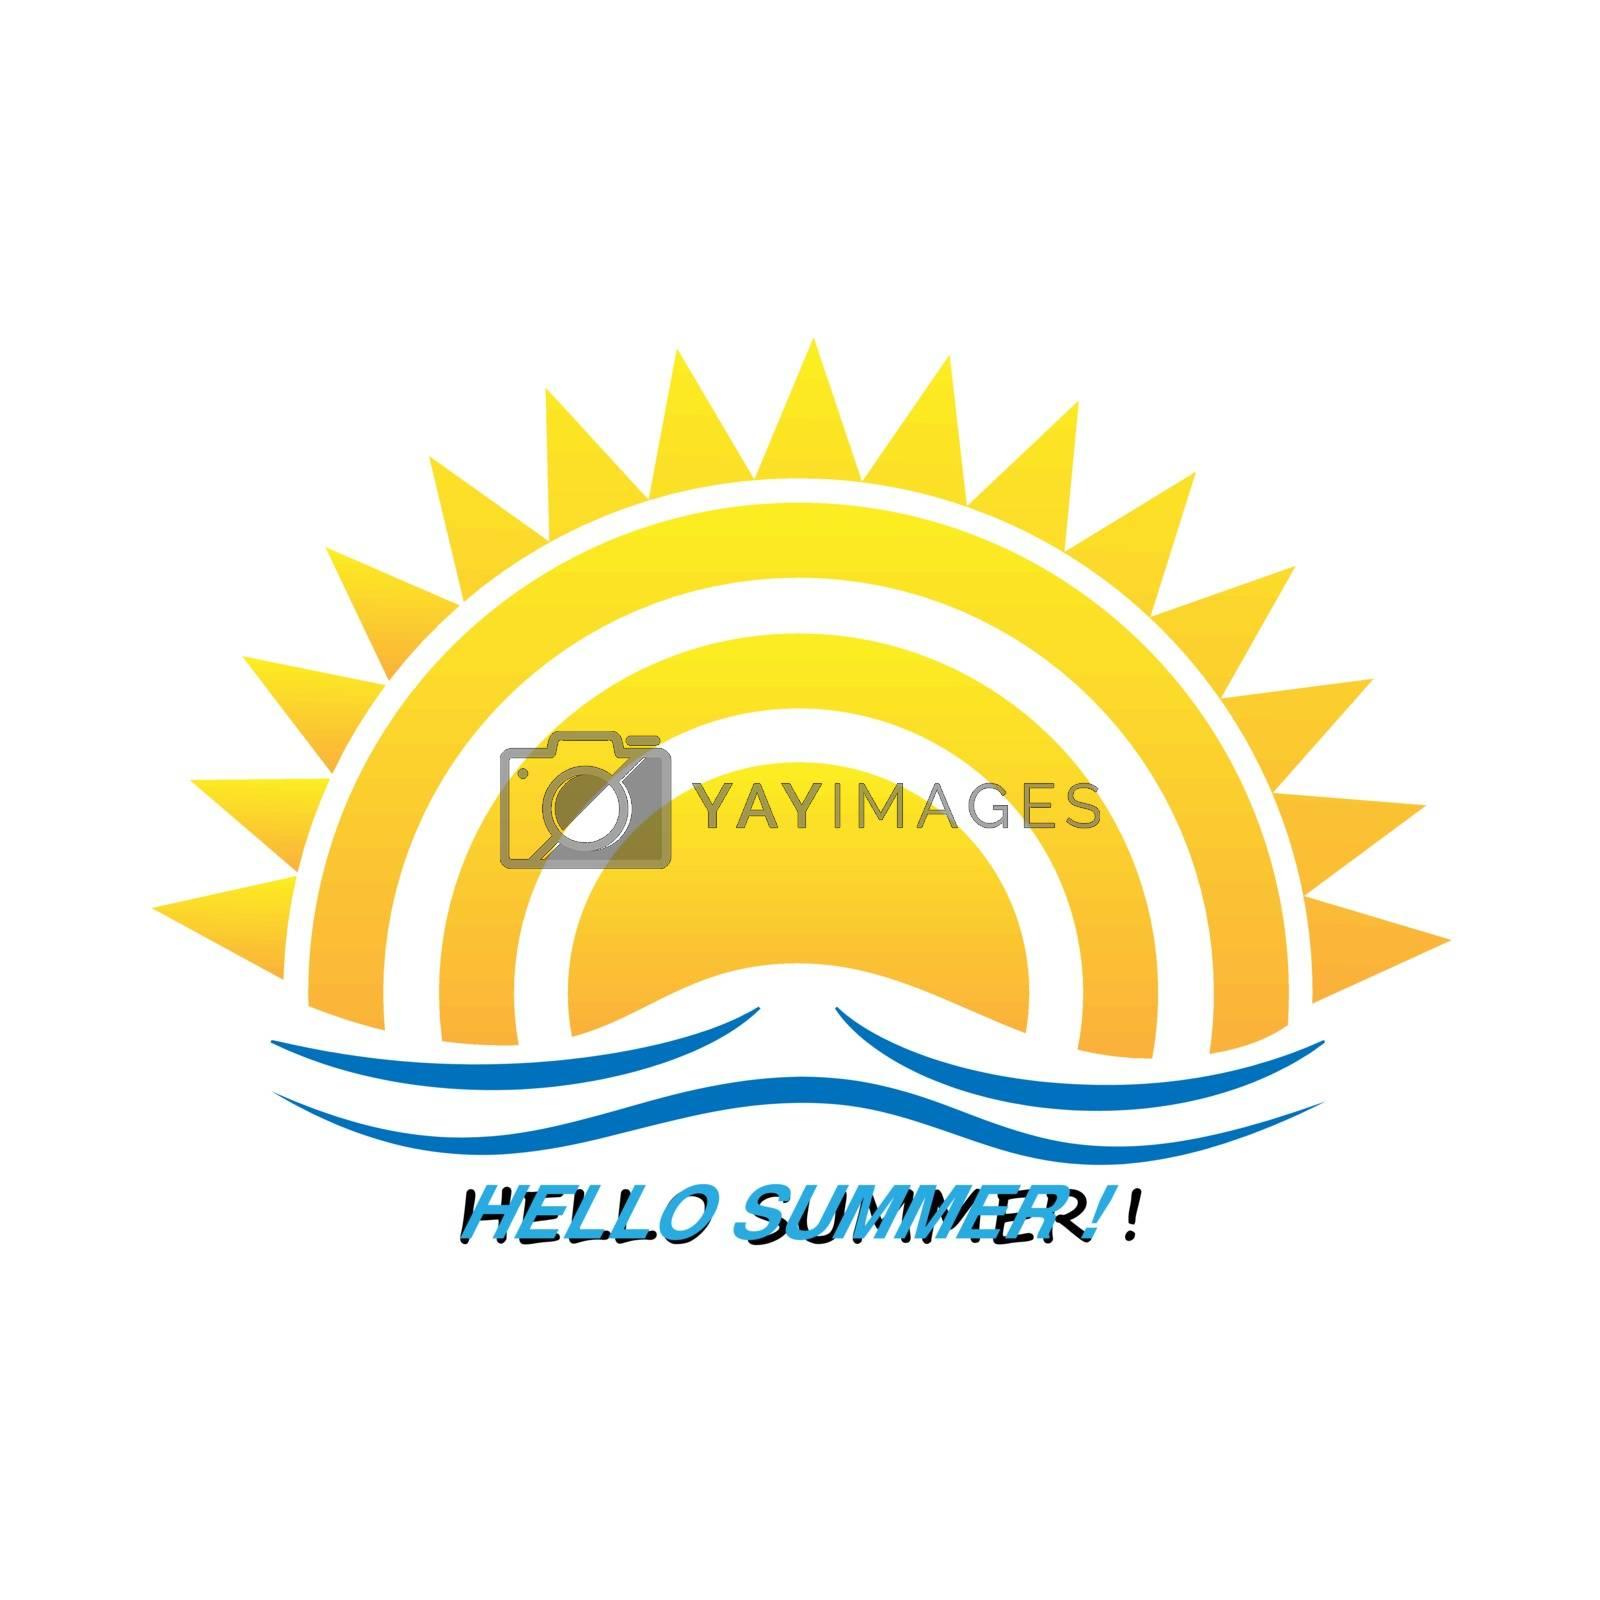 Sun logo in flat design and inscription Hello summer